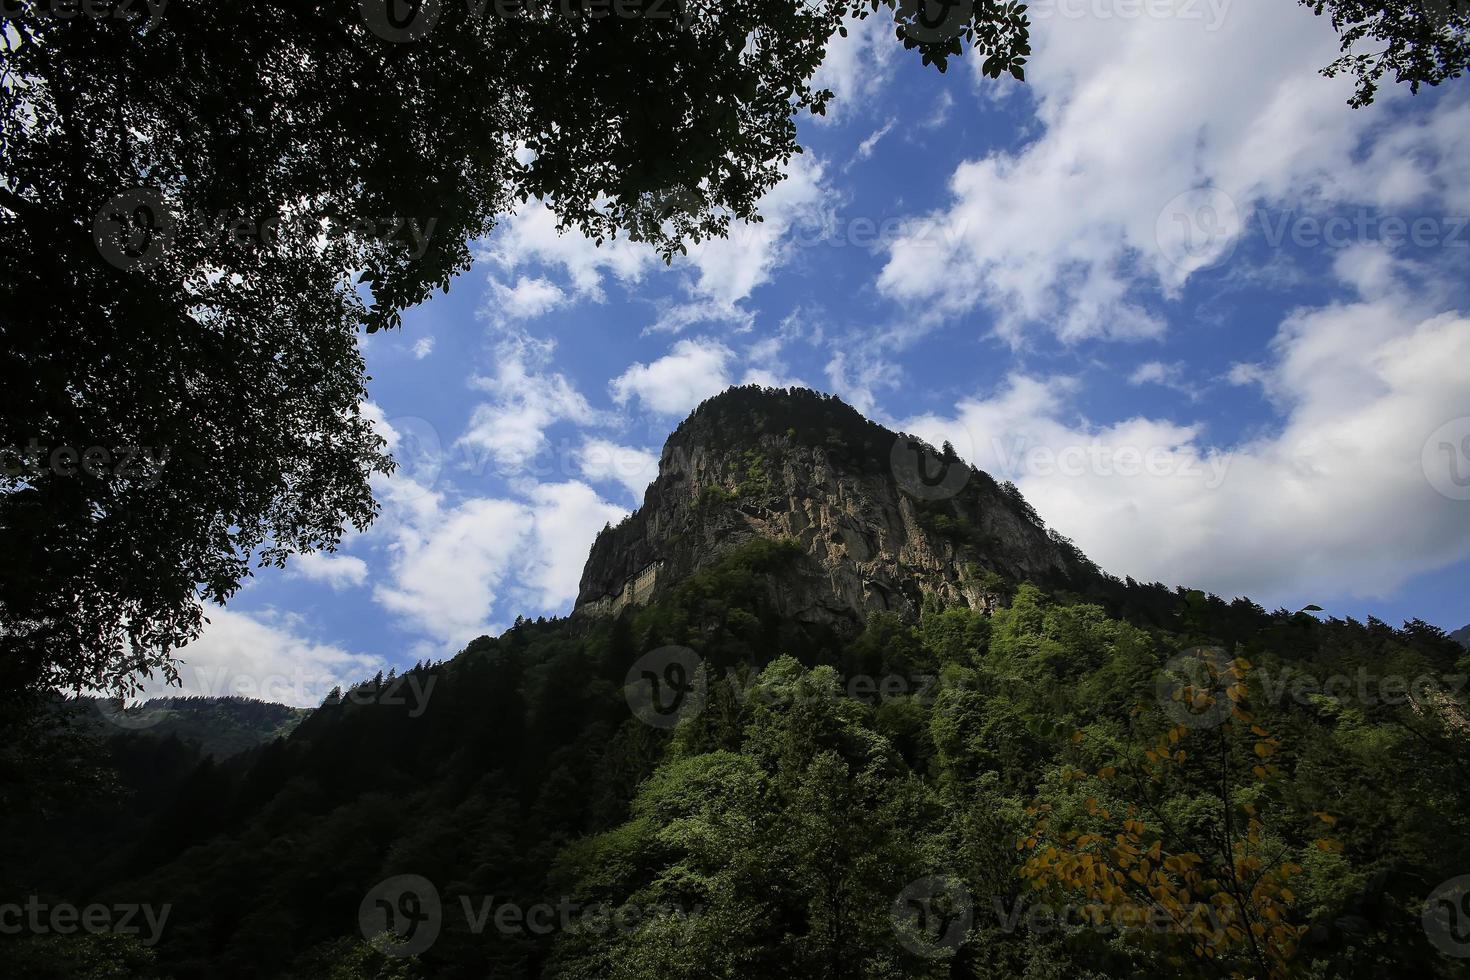 sumela klooster foto